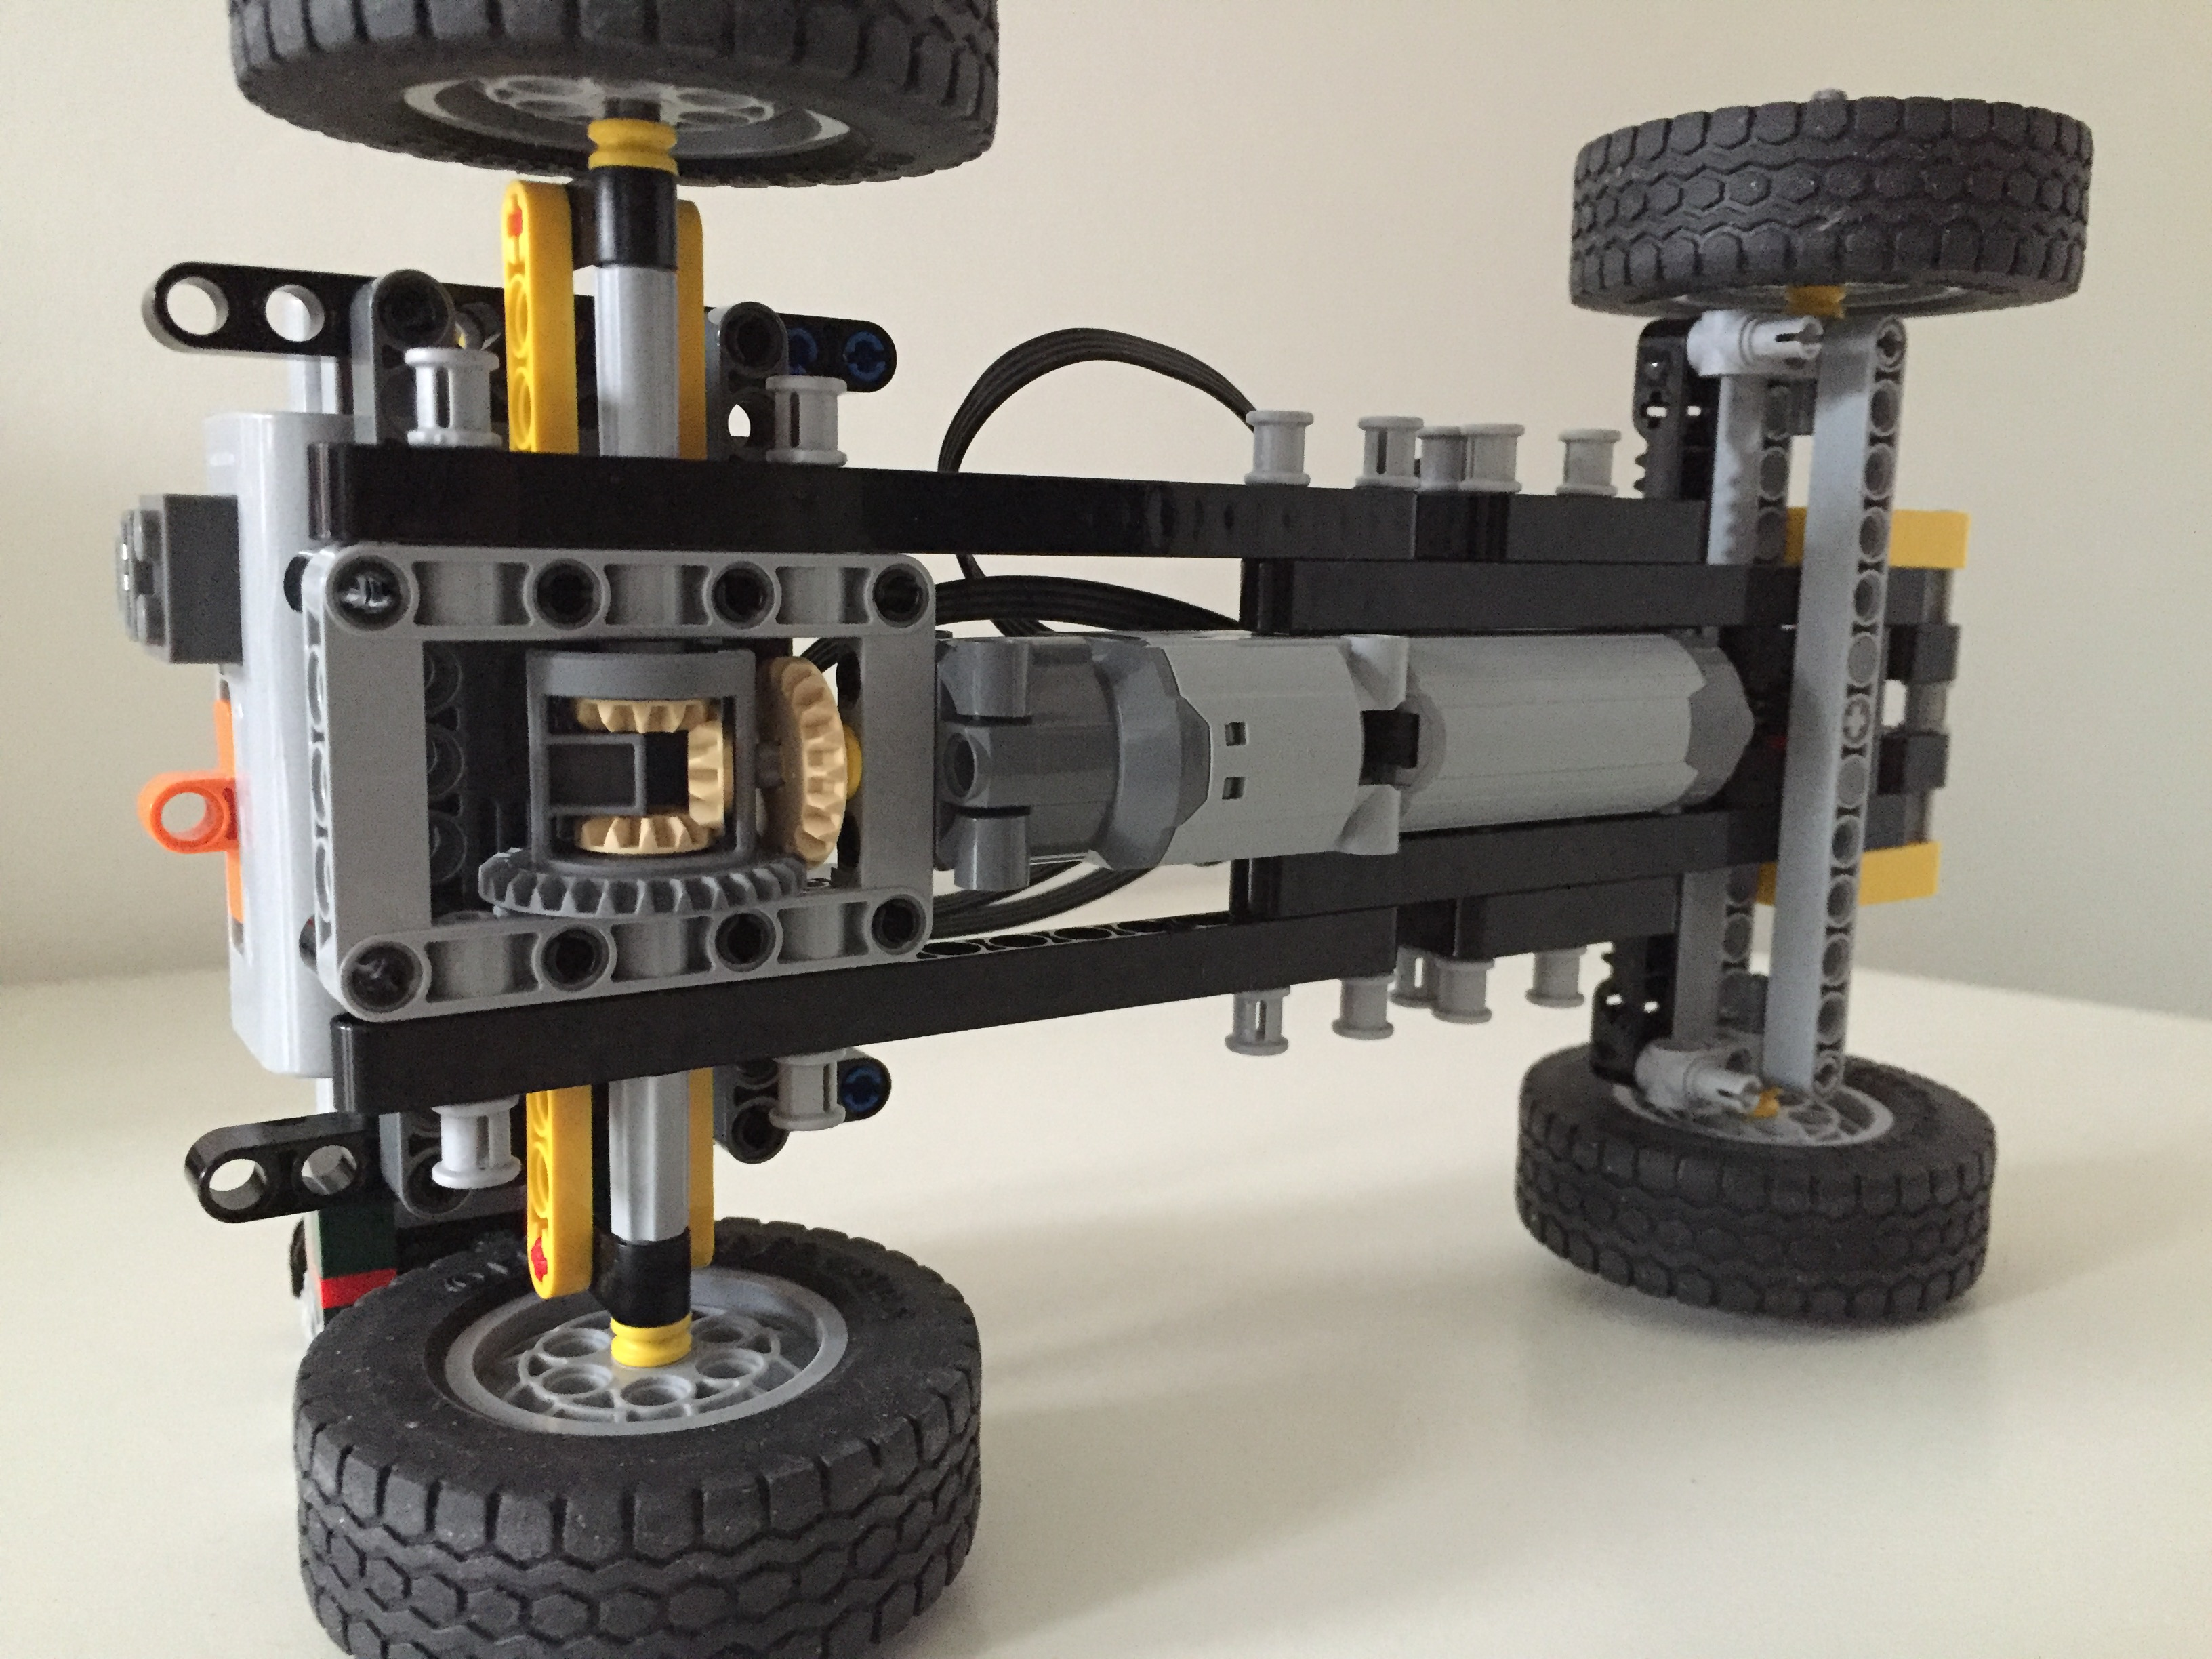 Lego Moc 3925 Rc Car Frame Technic 2015 Rebrickable Build